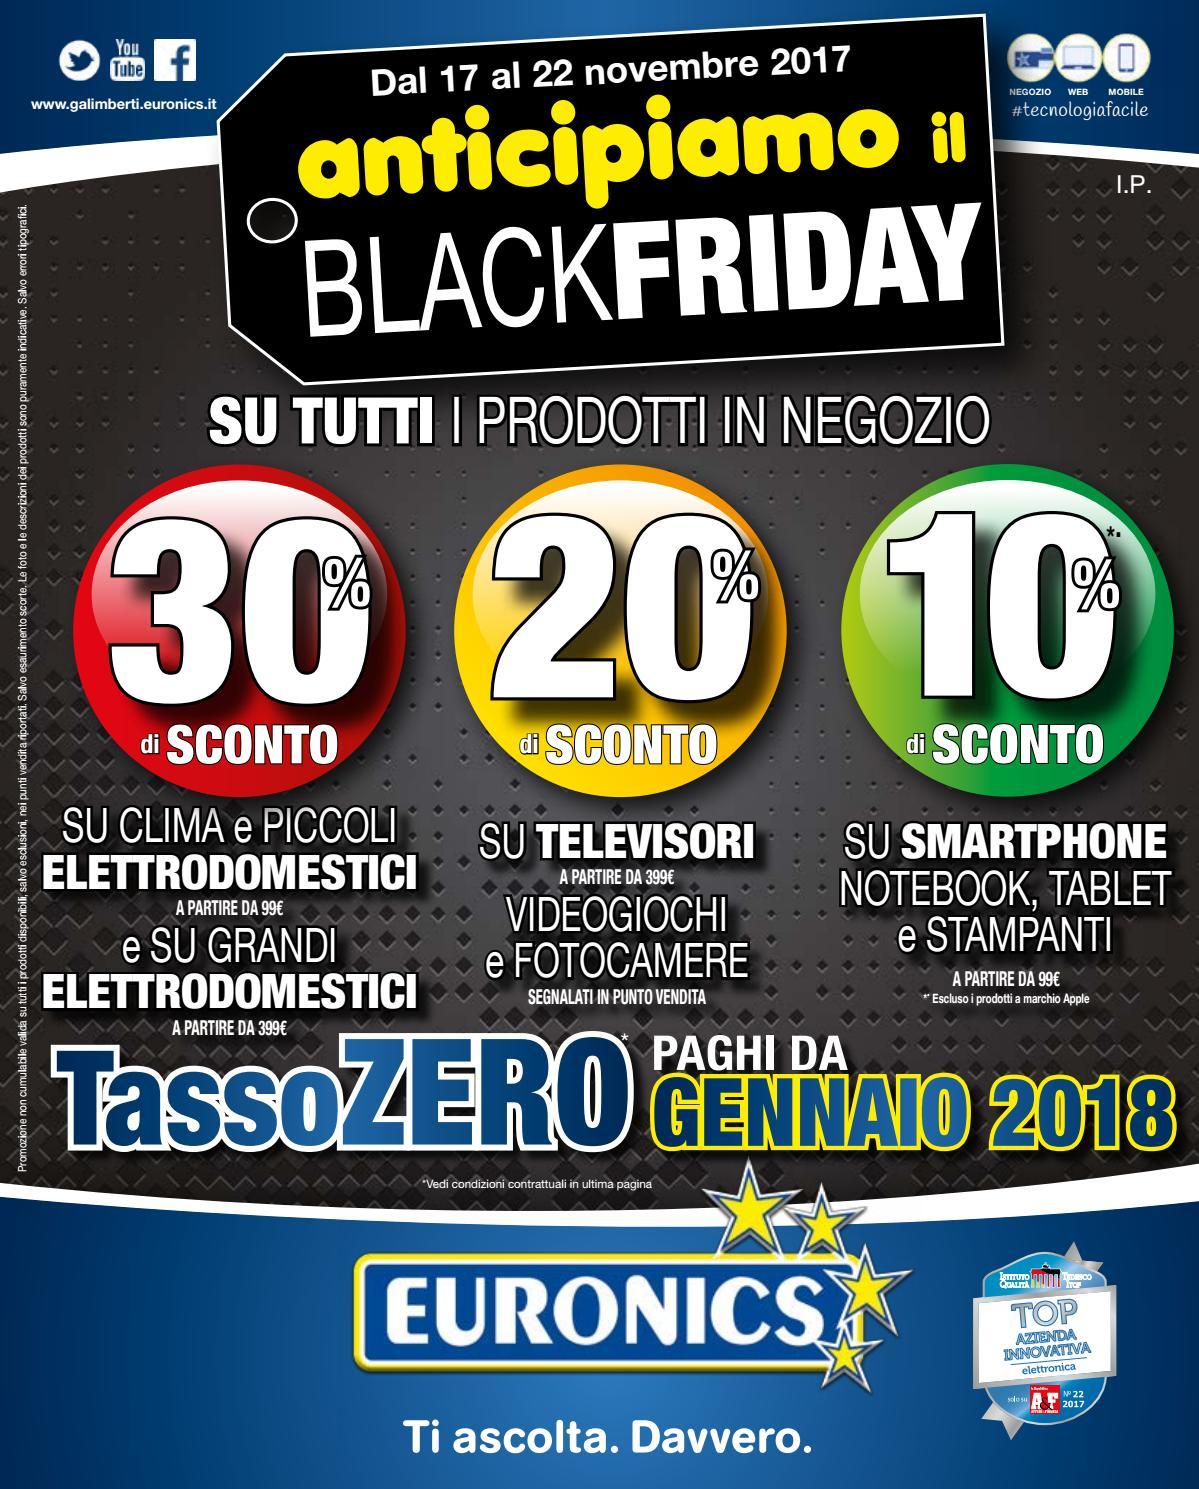 Galimberti anticipiamo il black friday by euronics italia for Black friday televisori